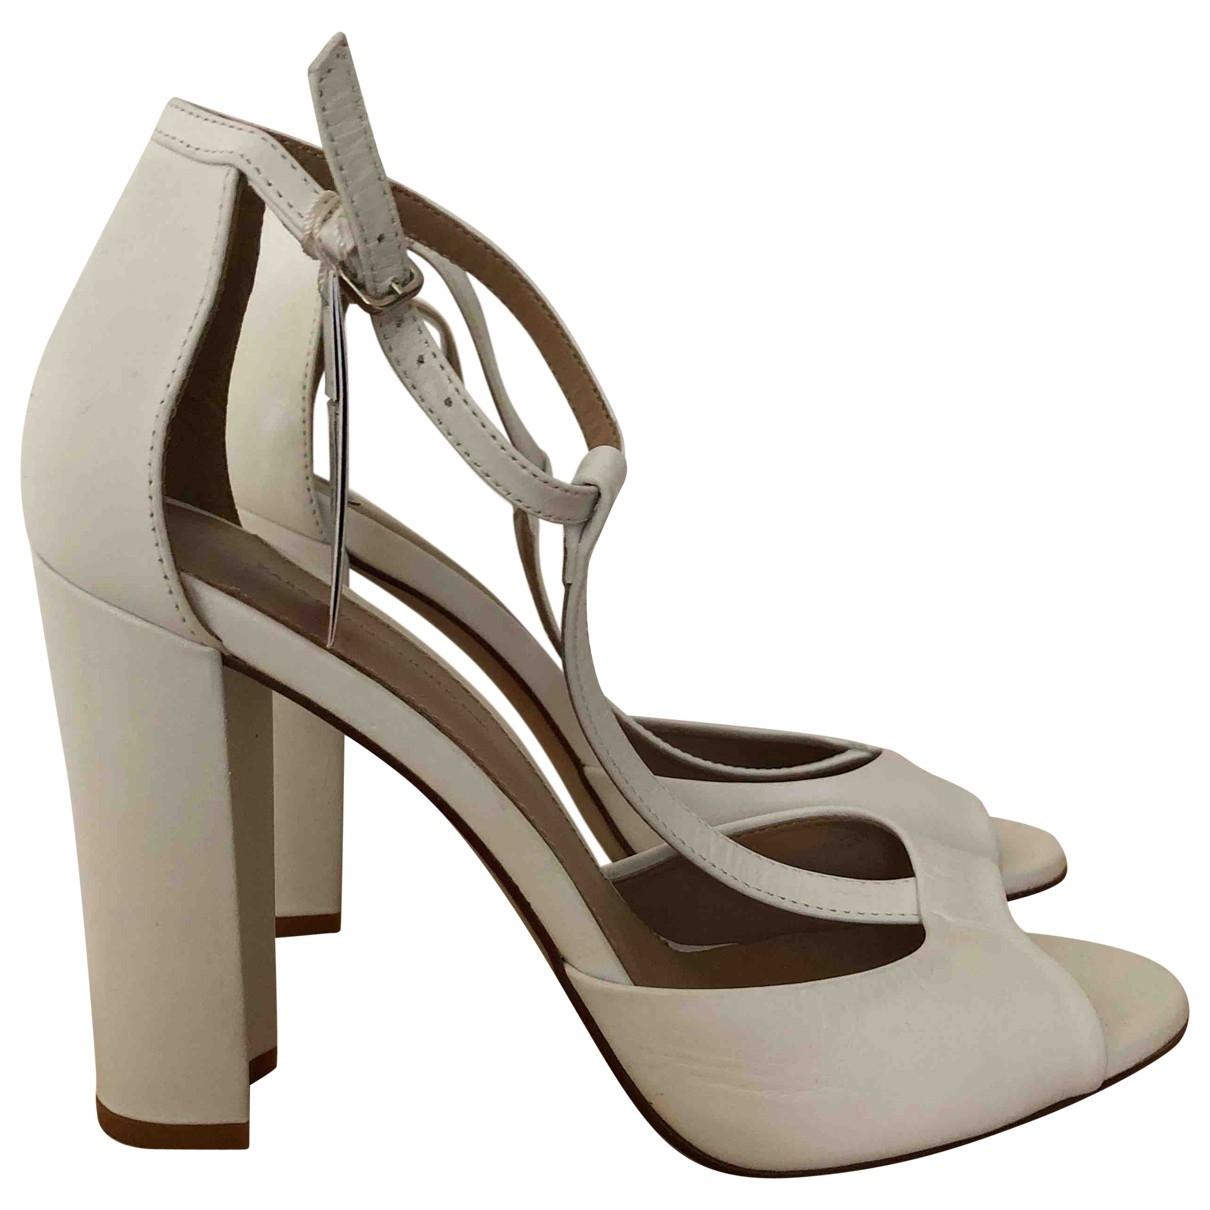 Zara \N White Leather Sandals for Women 40 EU